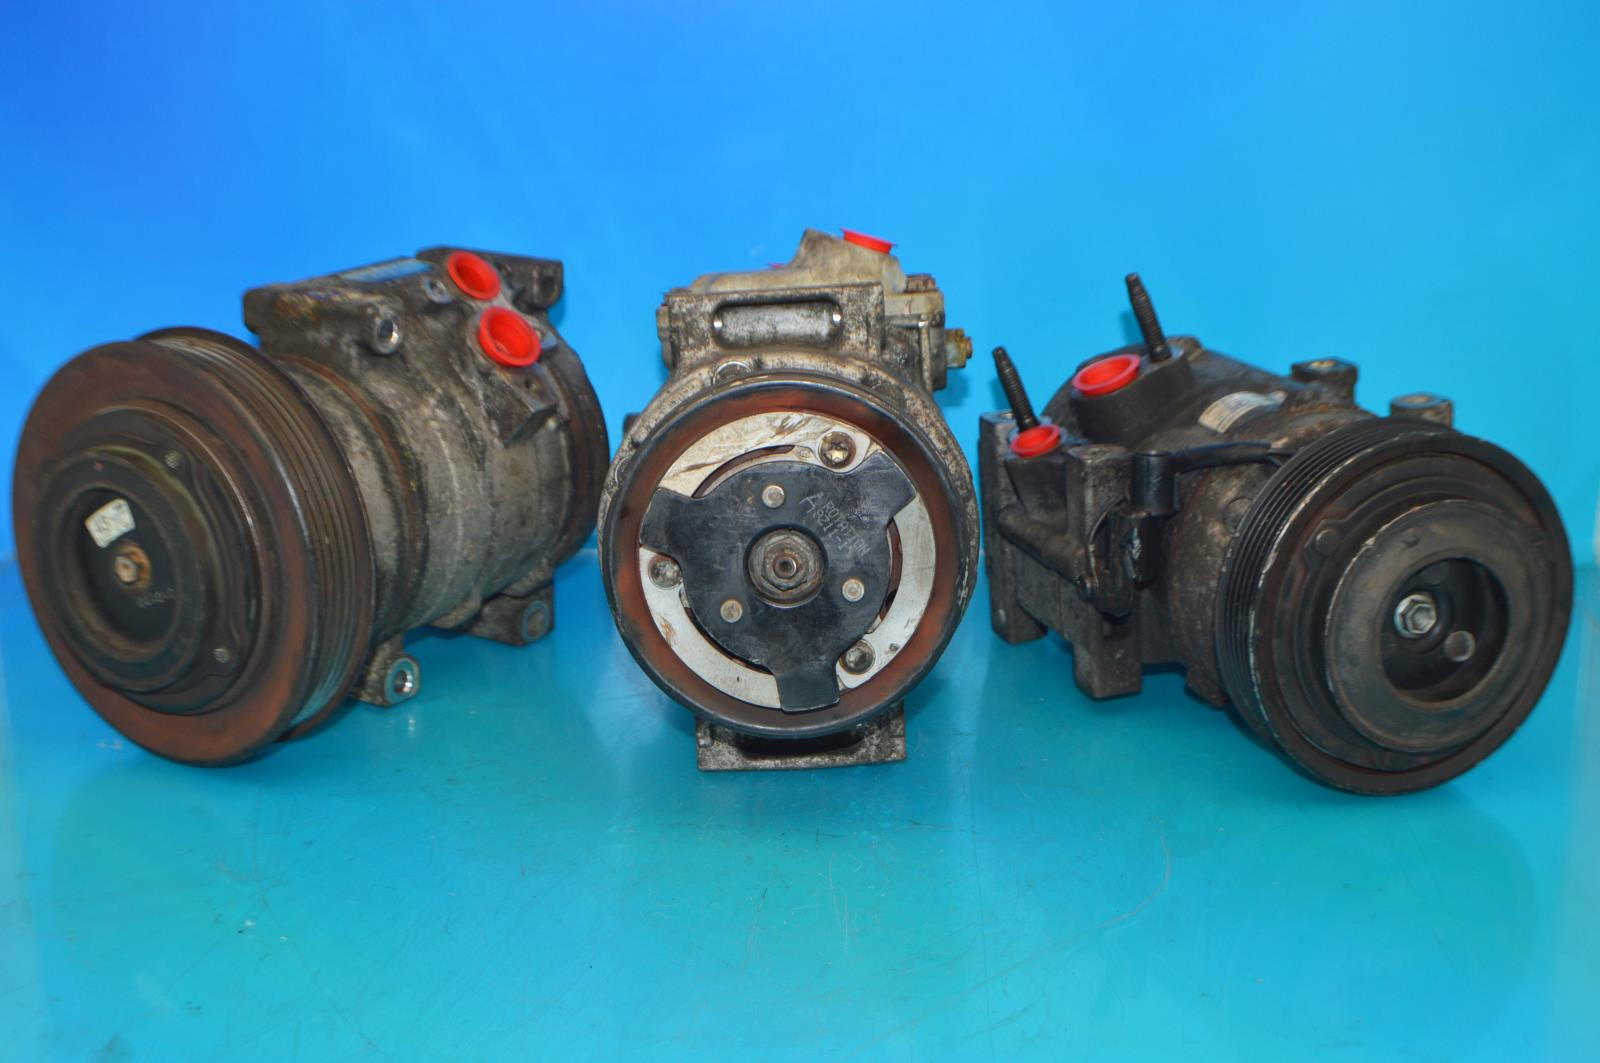 ac compressor for audi 100 200 5000 80 90 s4 v8 quattro used rh ebay com Dodge a C Compressor Nissan a C Compressor